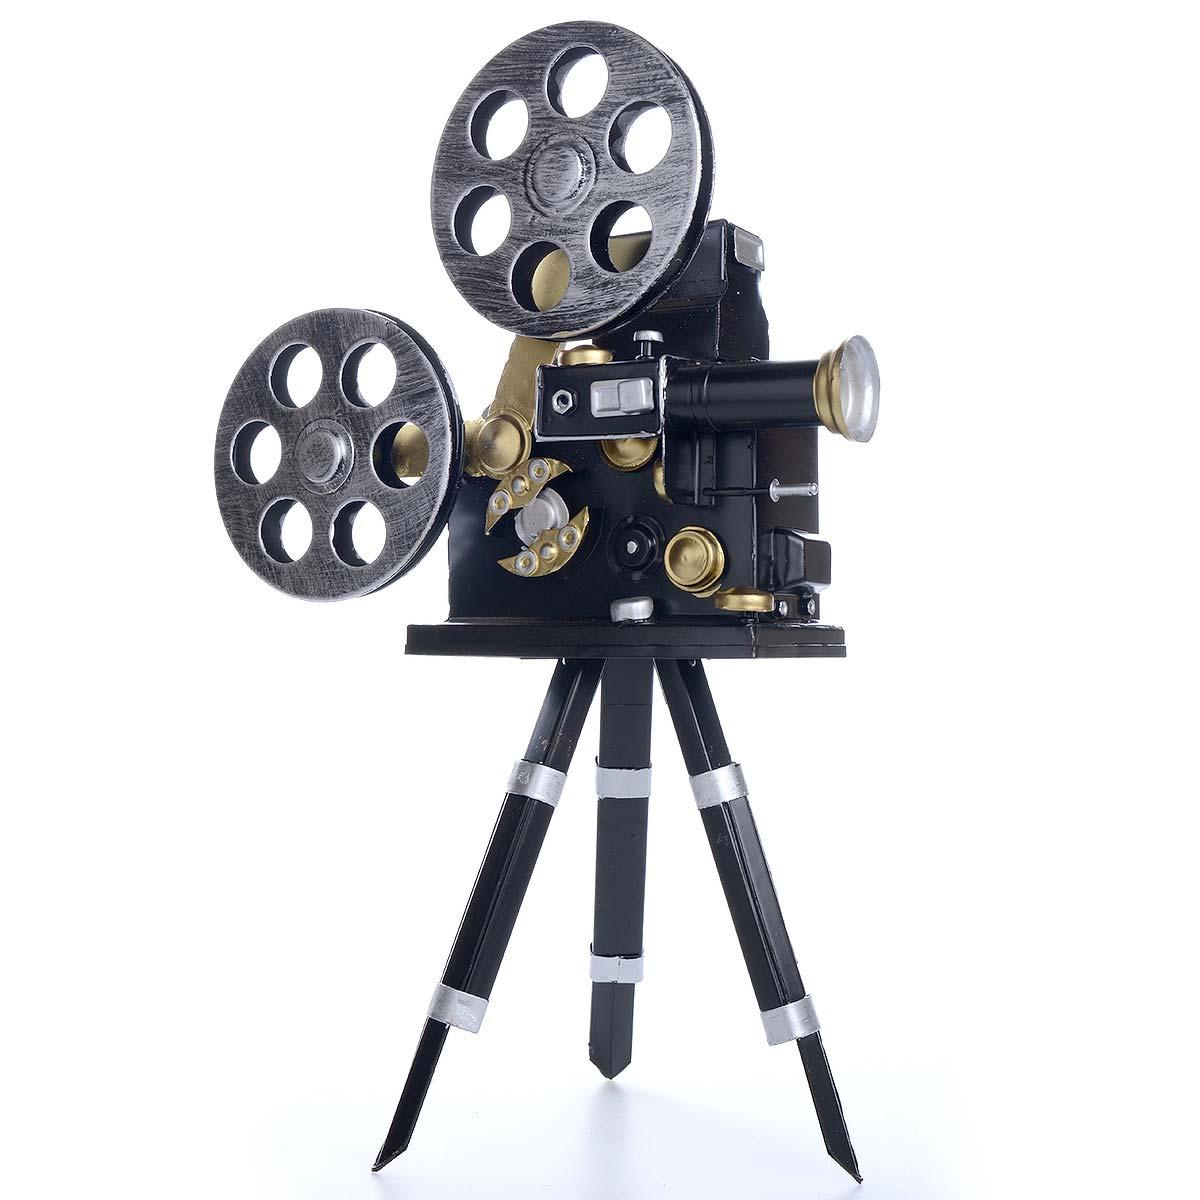 Vintage χειροποίητη διακοσμητική κάμερα μεταλλική με τρίποδο - ΟΕΜ 51560